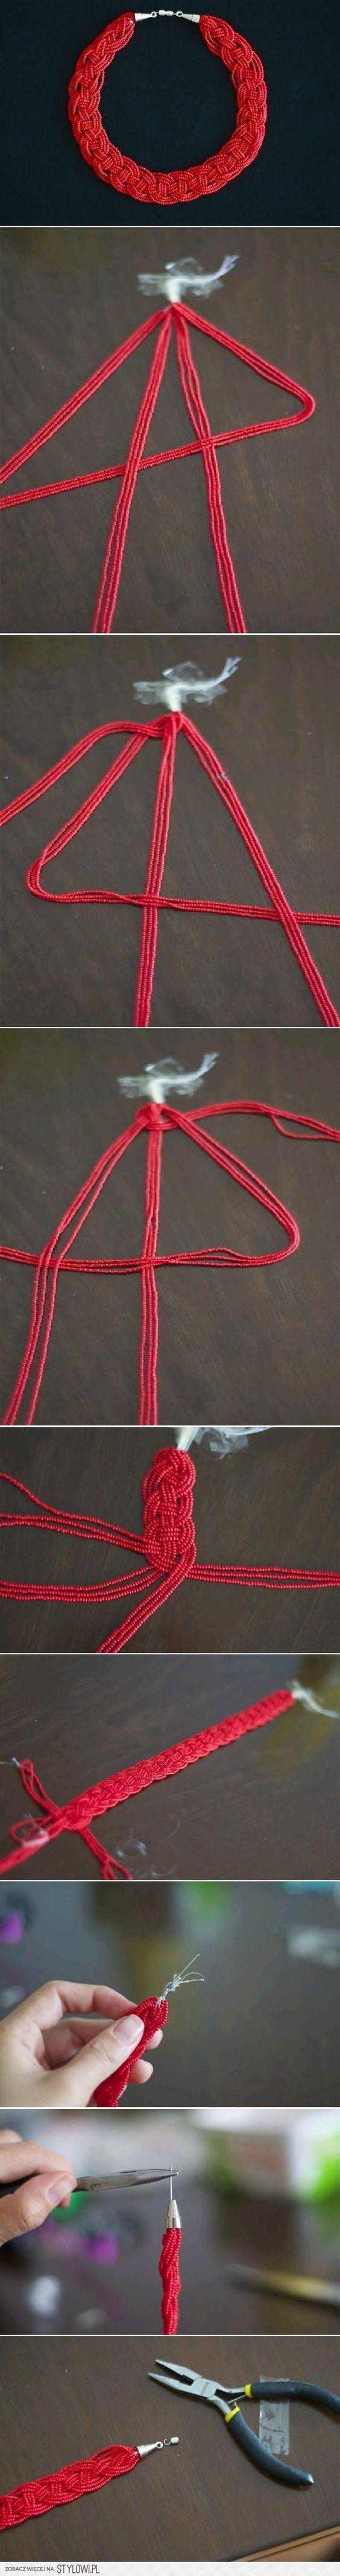 DIY Pretty Bead Necklace DIY Projects | UsefulDIY.com na Stylowi.pl